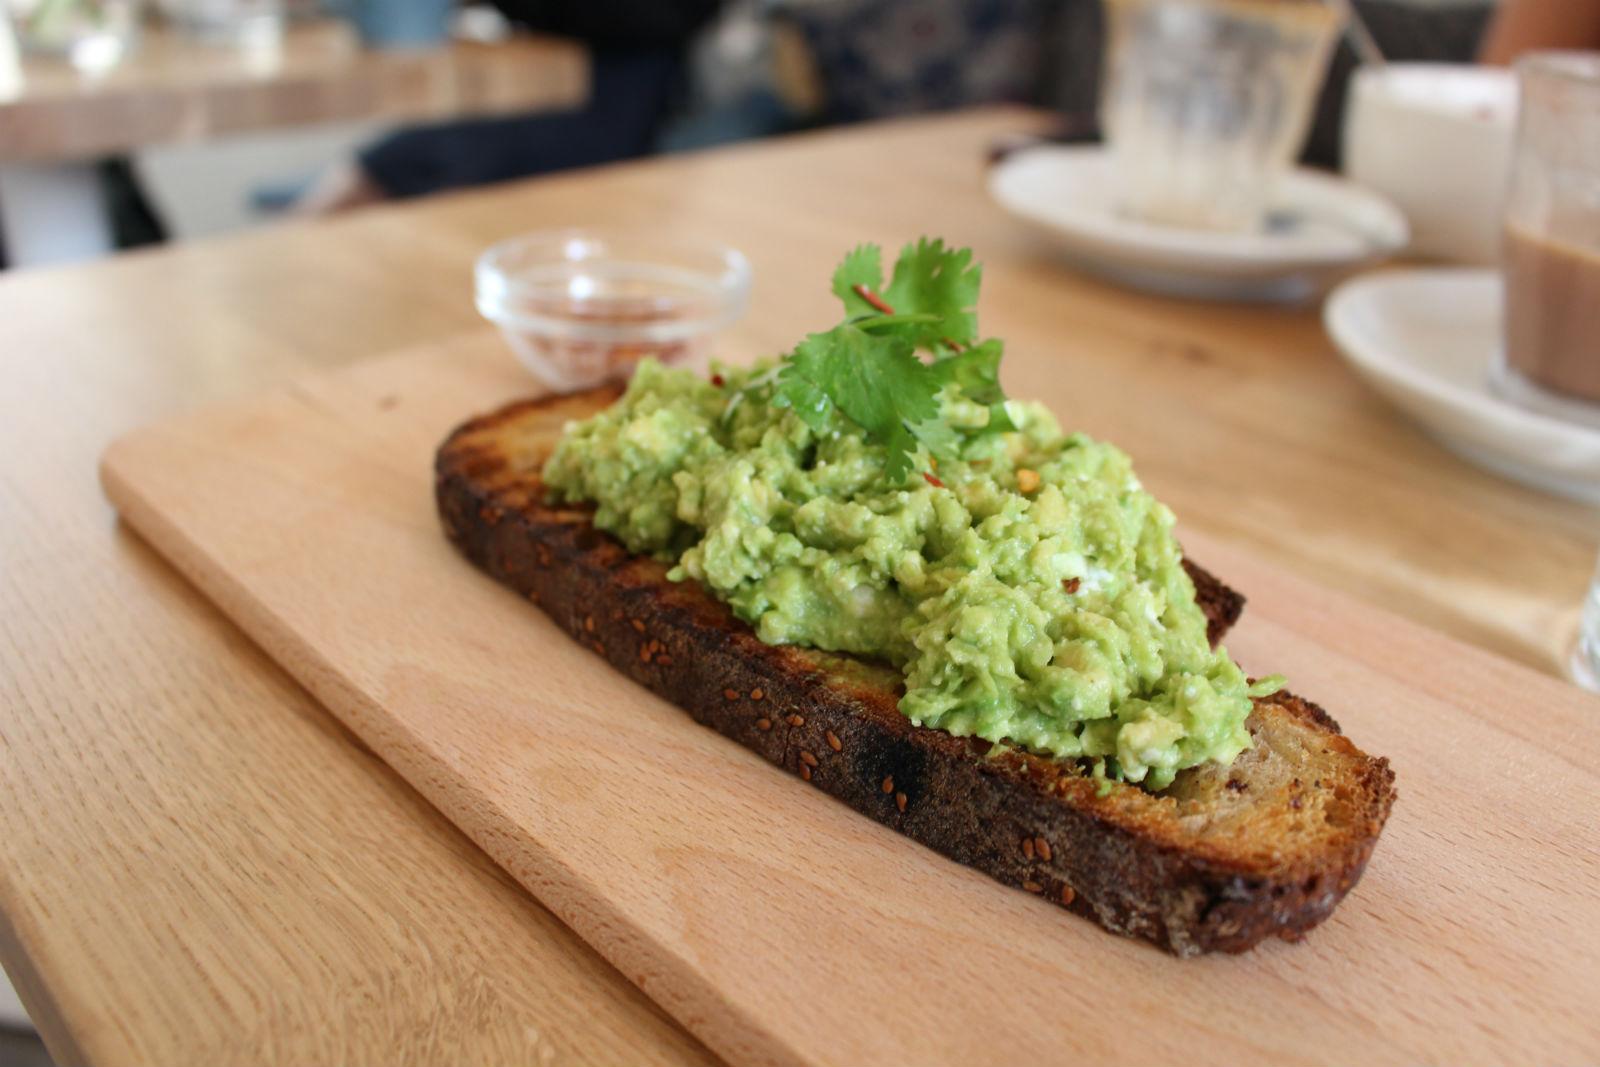 HiP Paris blog. Cafe Oberkampf. Avocado and feta cheese toast.